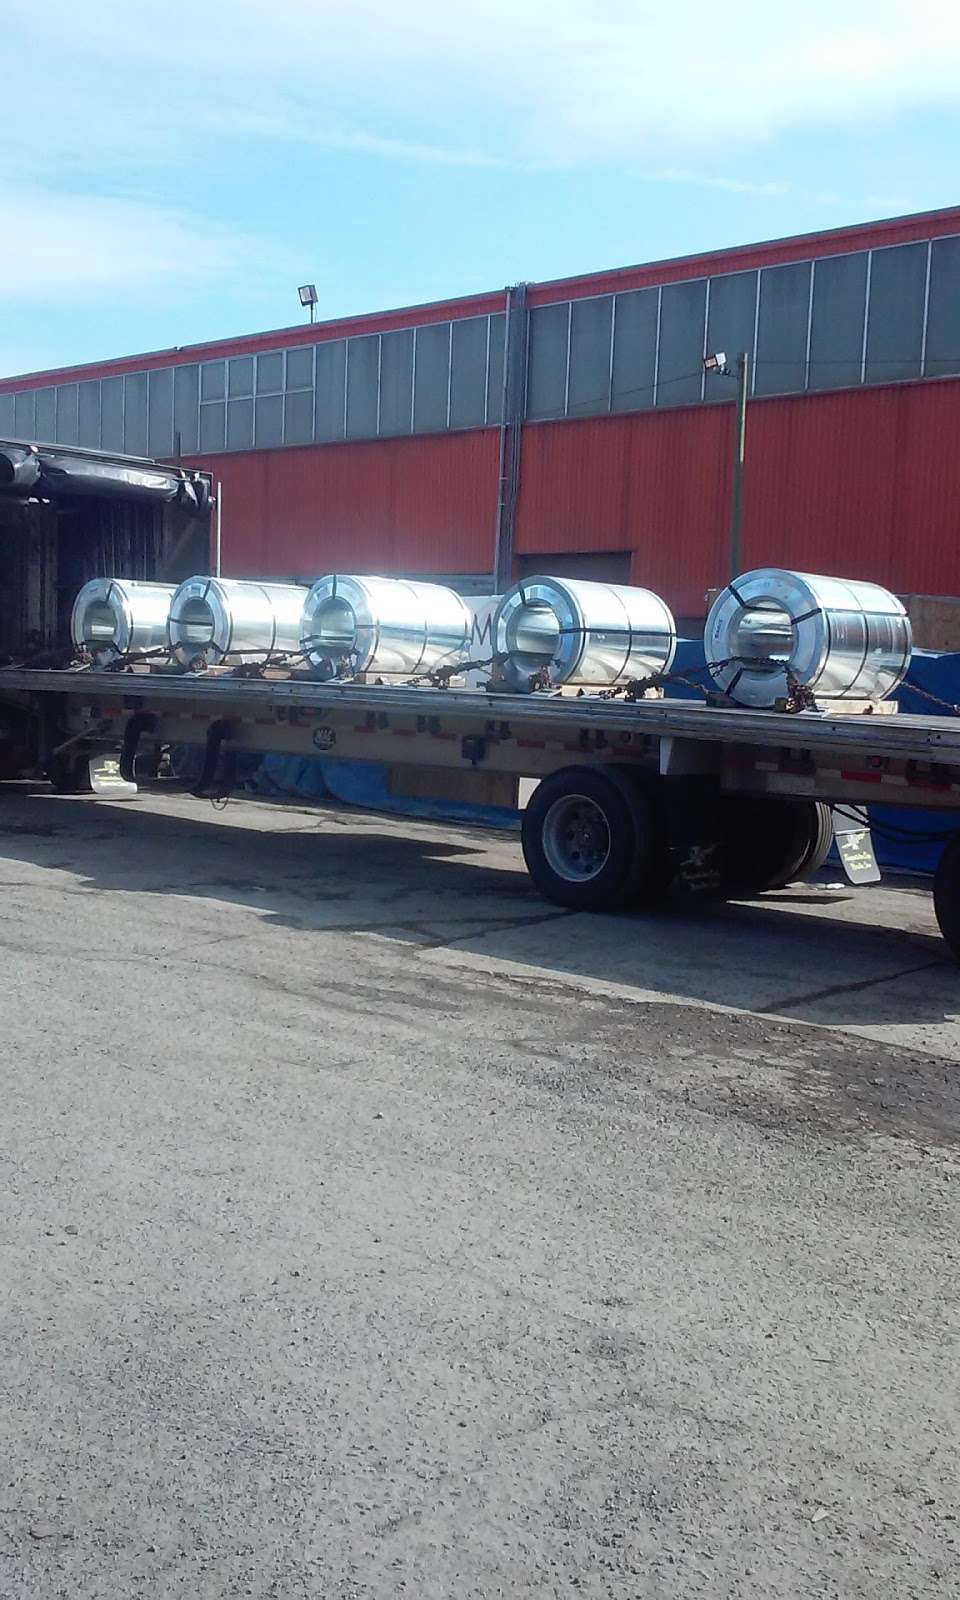 Harbor Freight Transport Corporation - moving company  | Photo 6 of 10 | Address: 301 Craneway St, Newark, NJ 07114, USA | Phone: (973) 589-6700